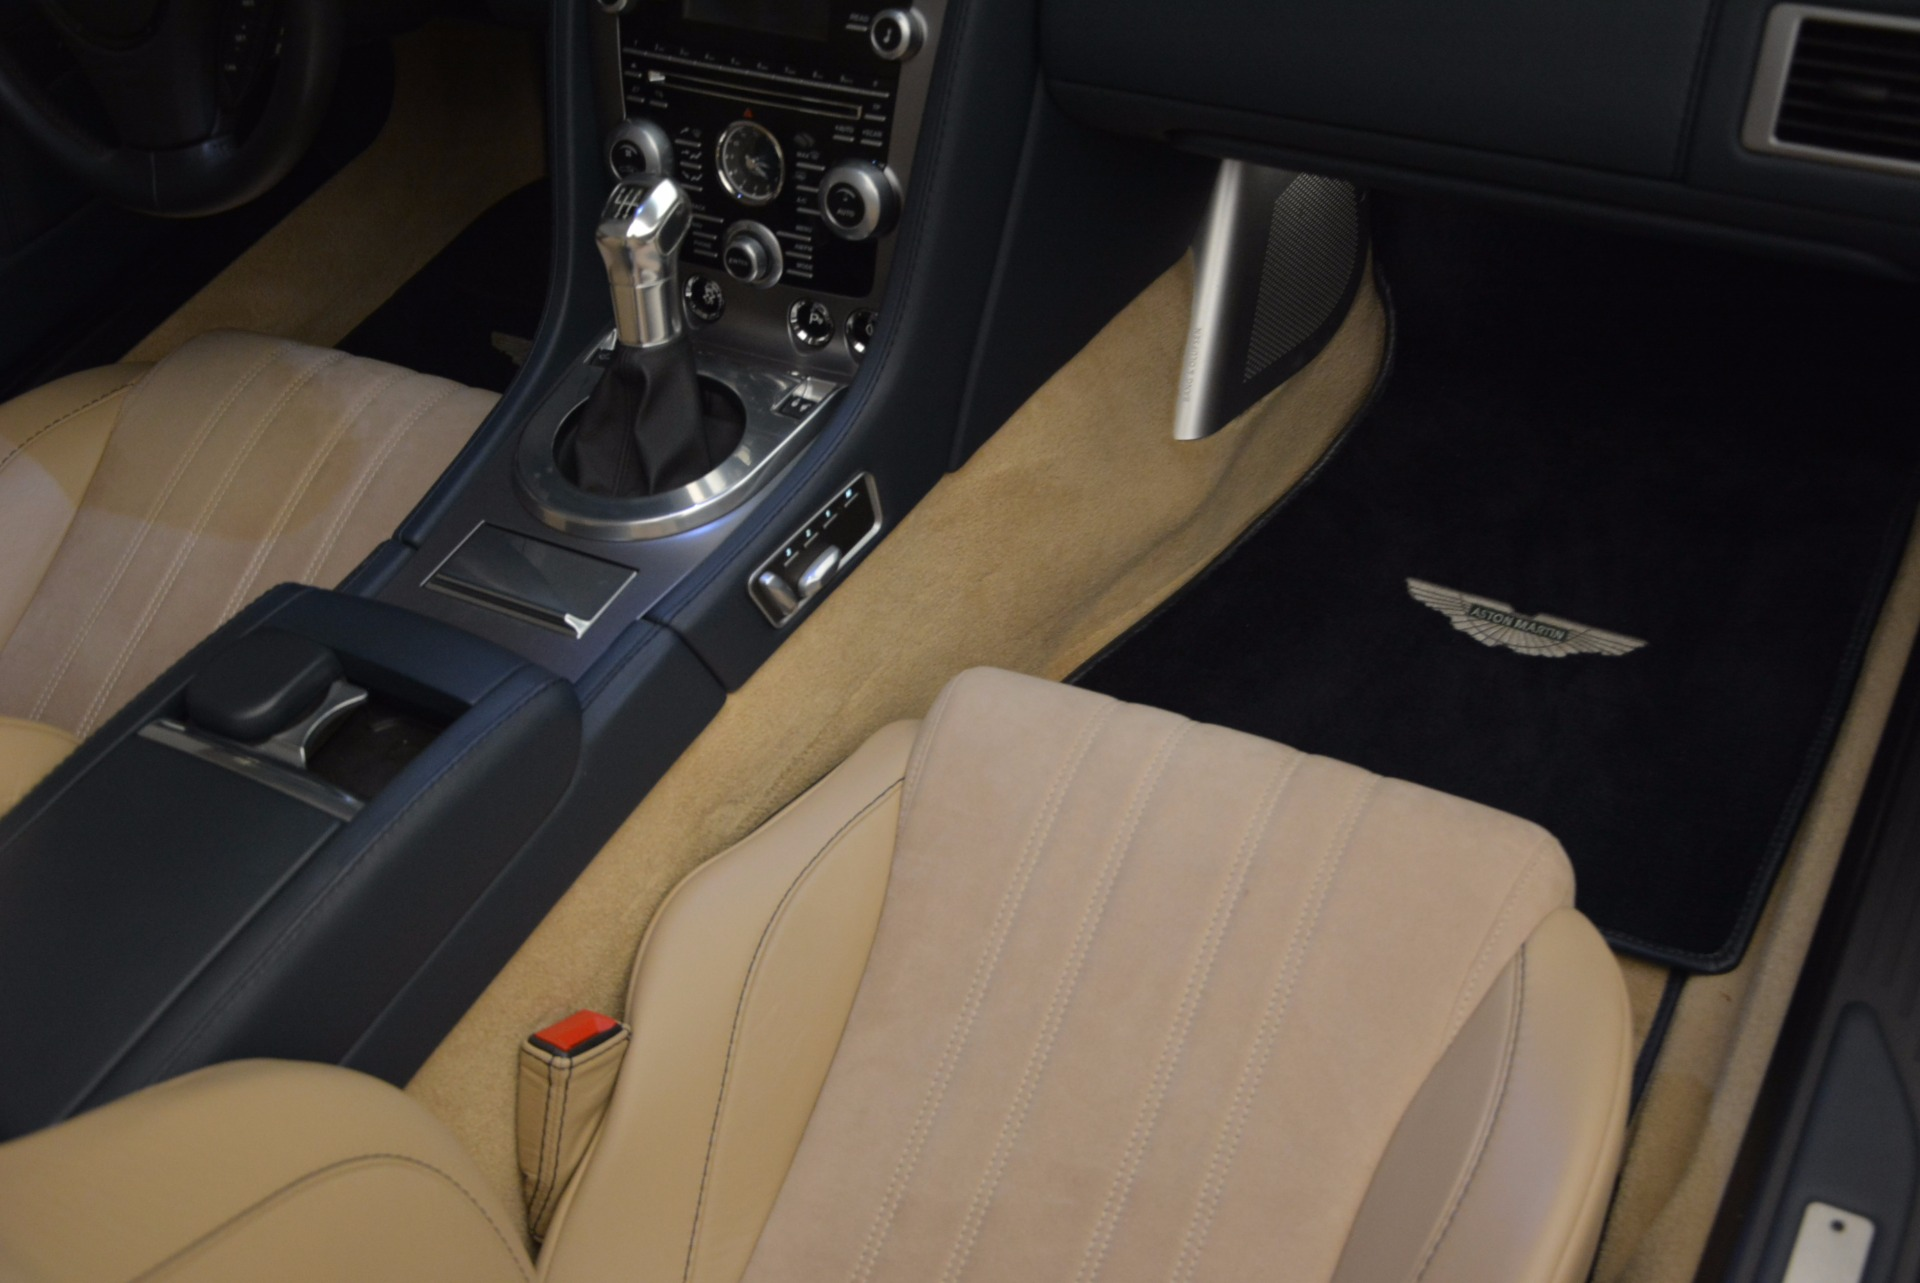 Used 2012 Aston Martin DBS Volante For Sale In Greenwich, CT 644_p33